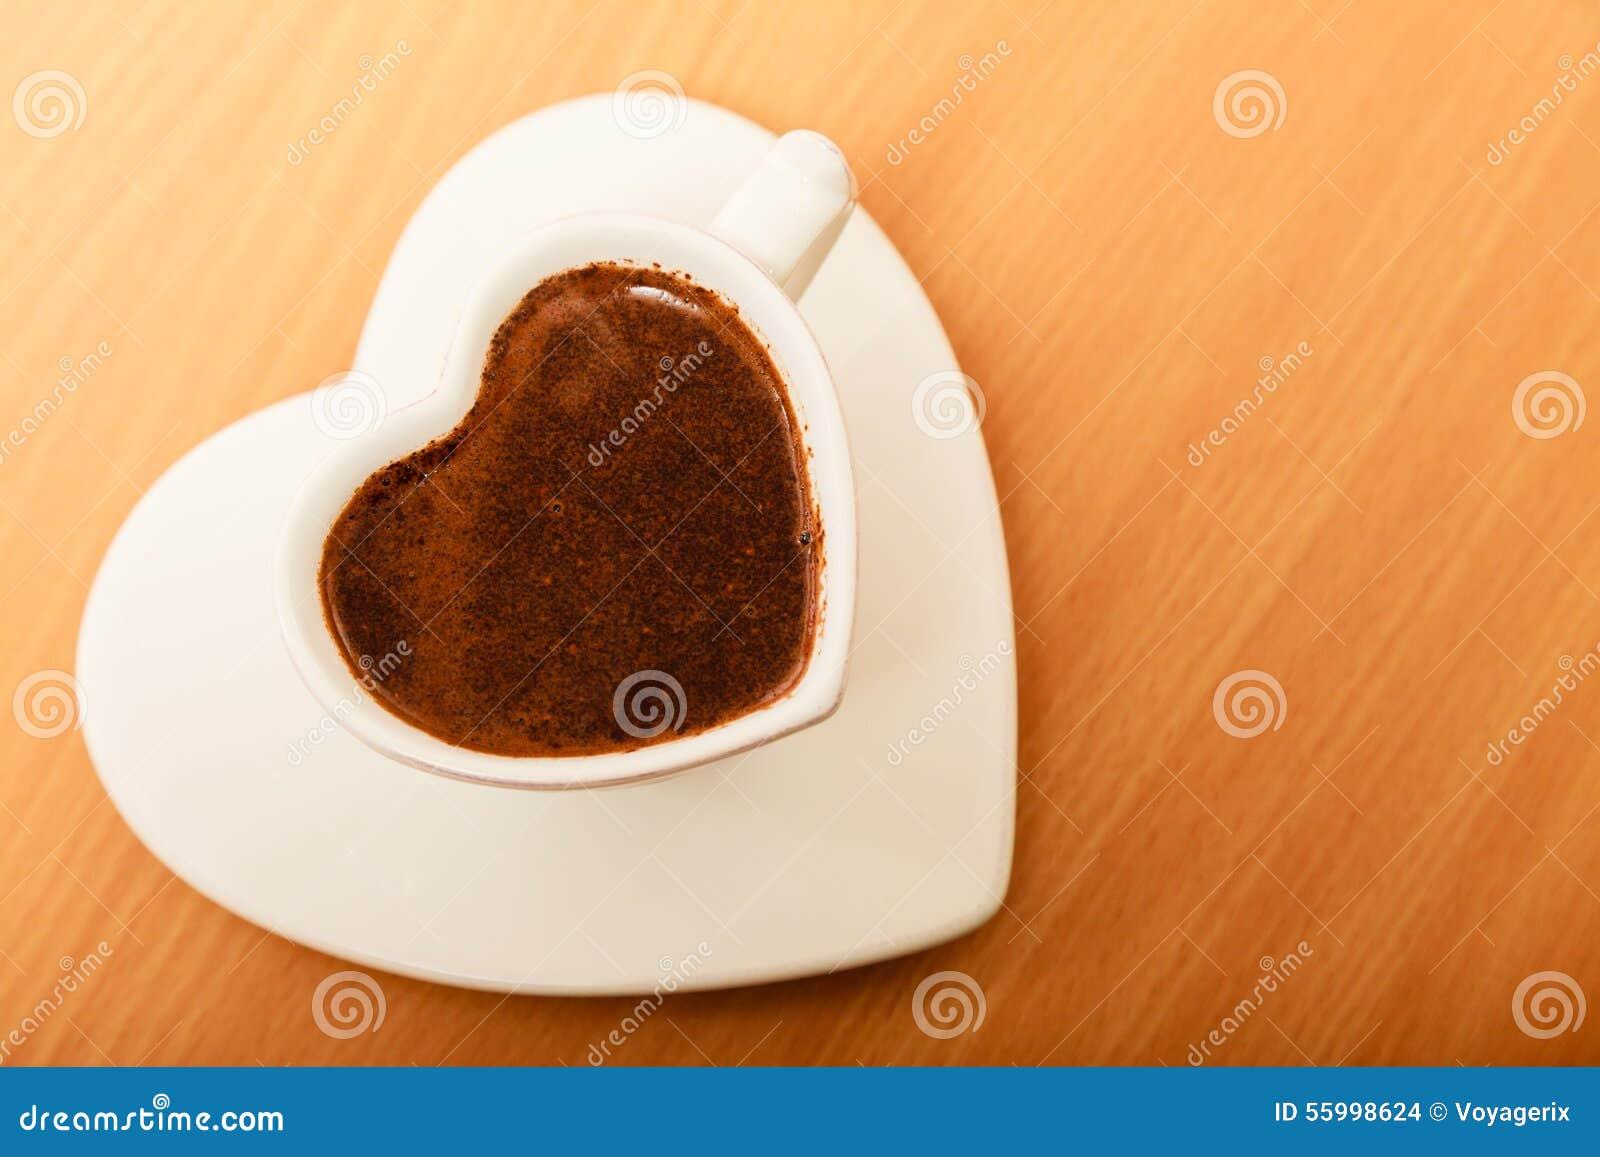 Coffee In Heart Shaped Cup Mug Caffeine Energy Stock